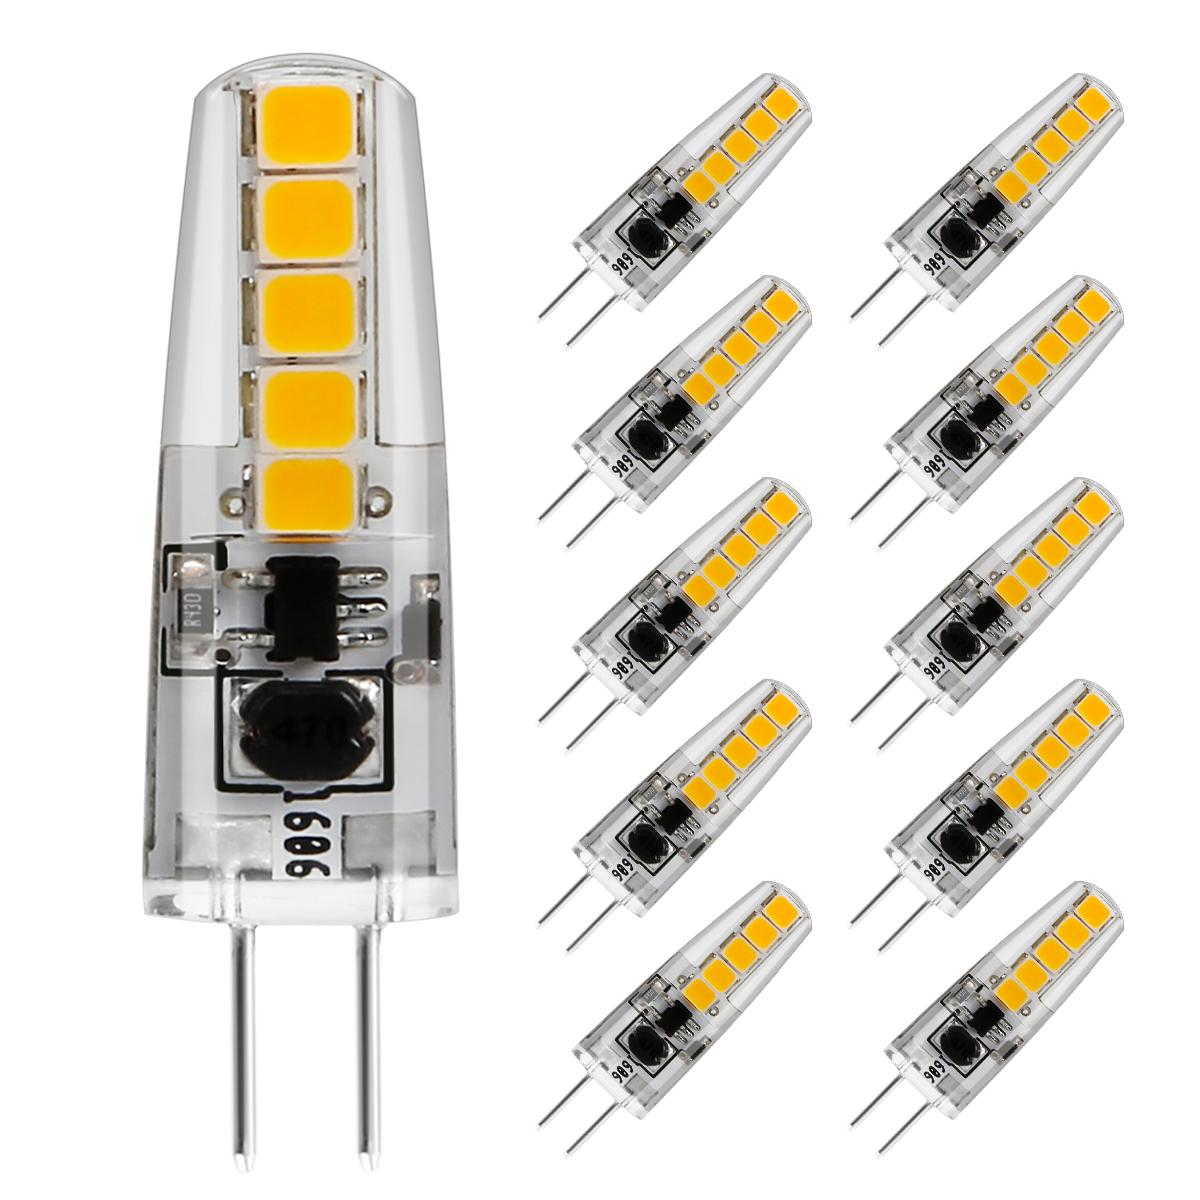 2W G4 LED Birnen, 210lm Leuchtmittel, 360°Abstrahlwinkel LED Lampen, ersetzt 20W Halogenlampen, 3000K Warmweiß, 10er Pack